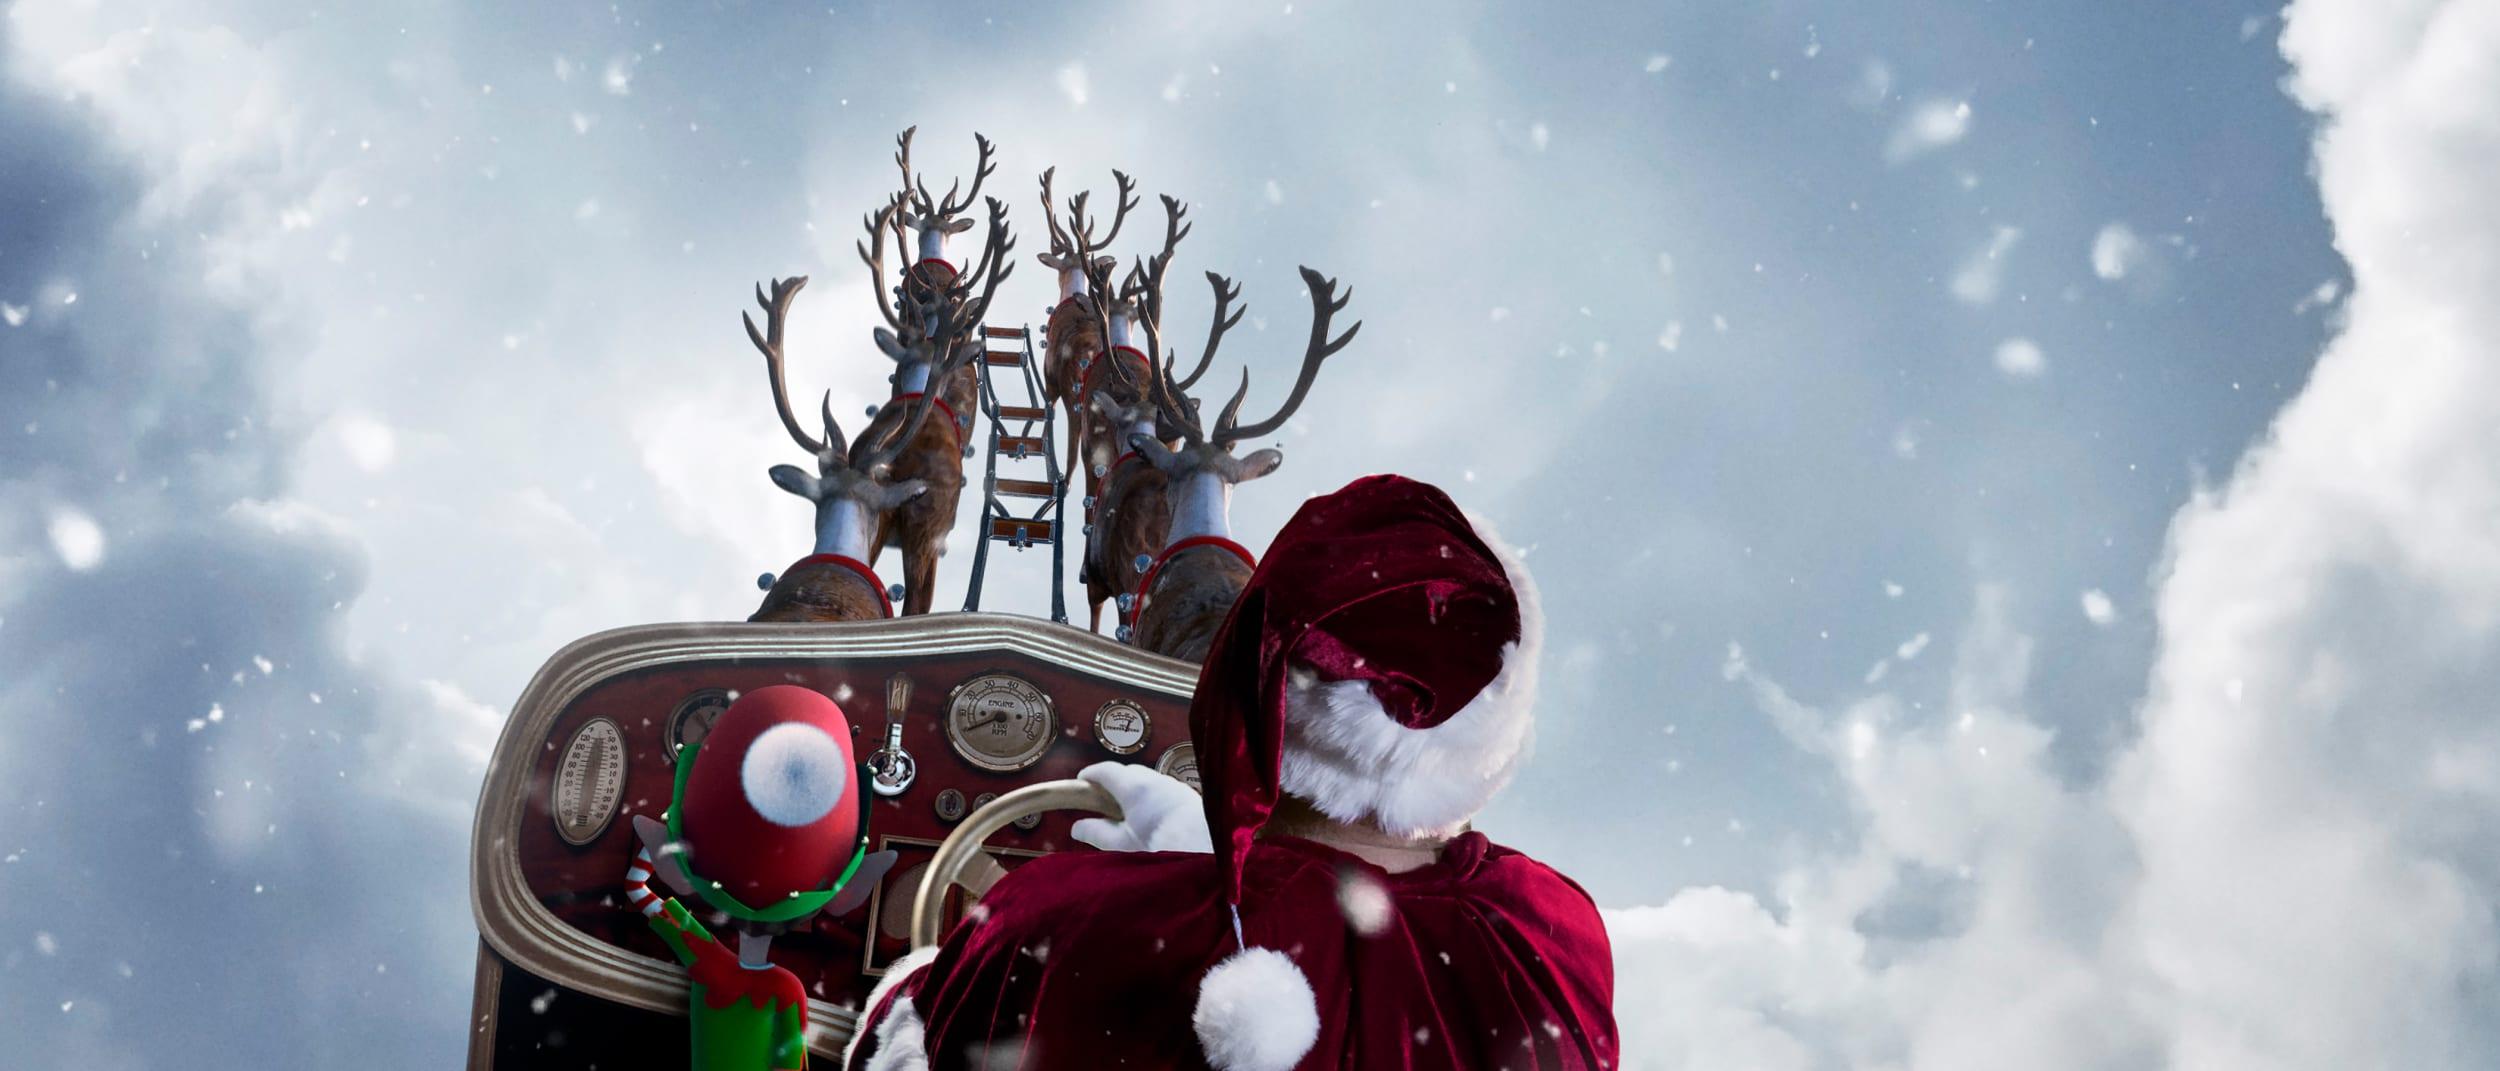 Santa's arrival show